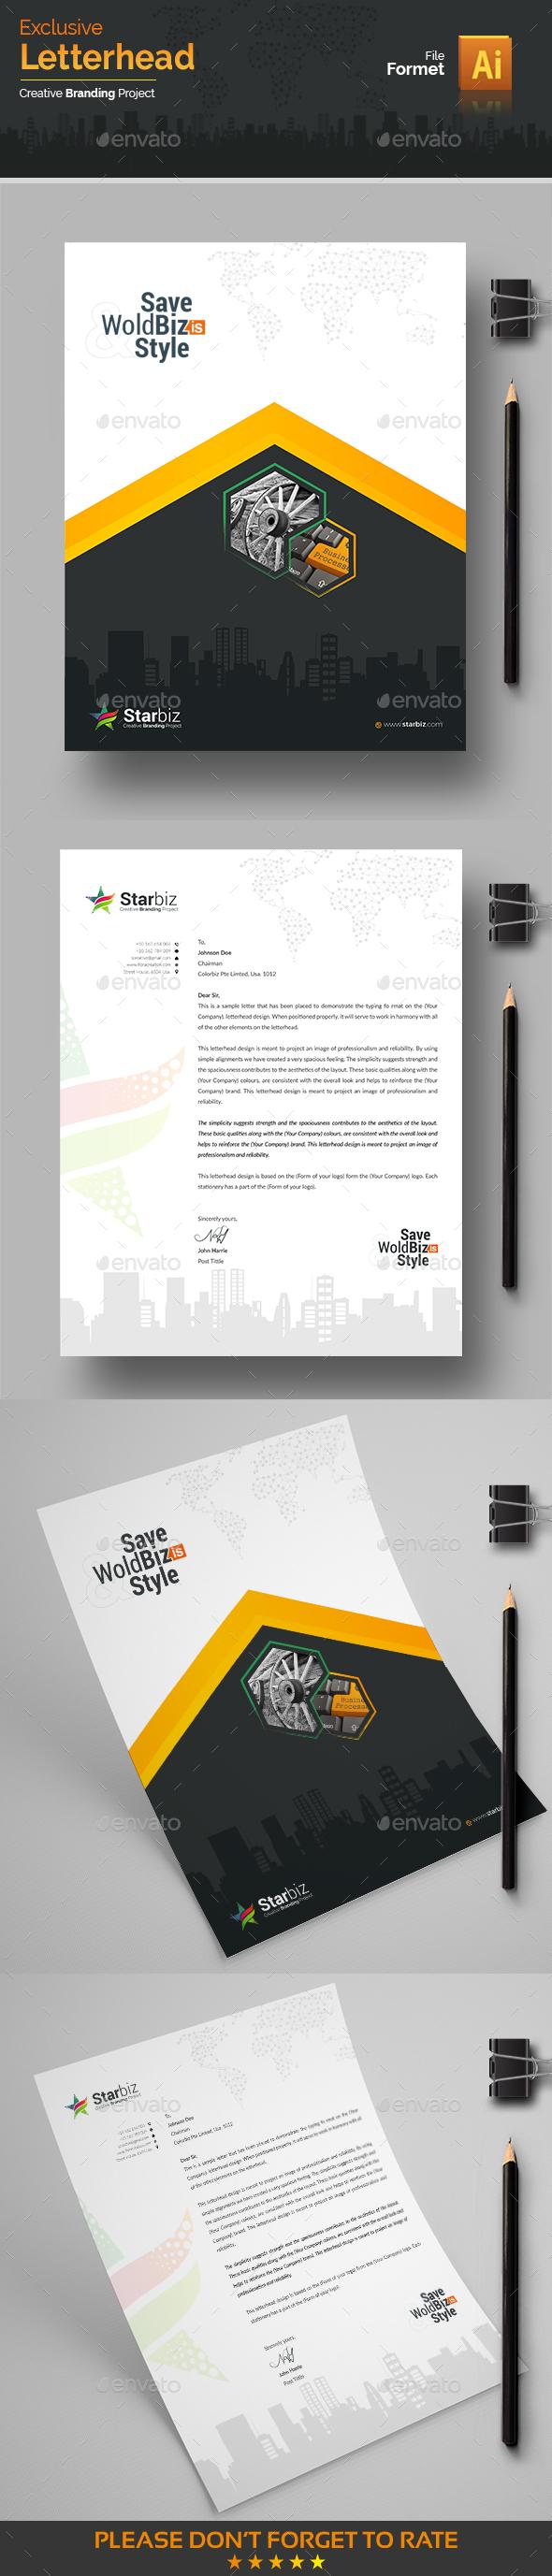 GraphicRiver Modern Letterhead 20649796